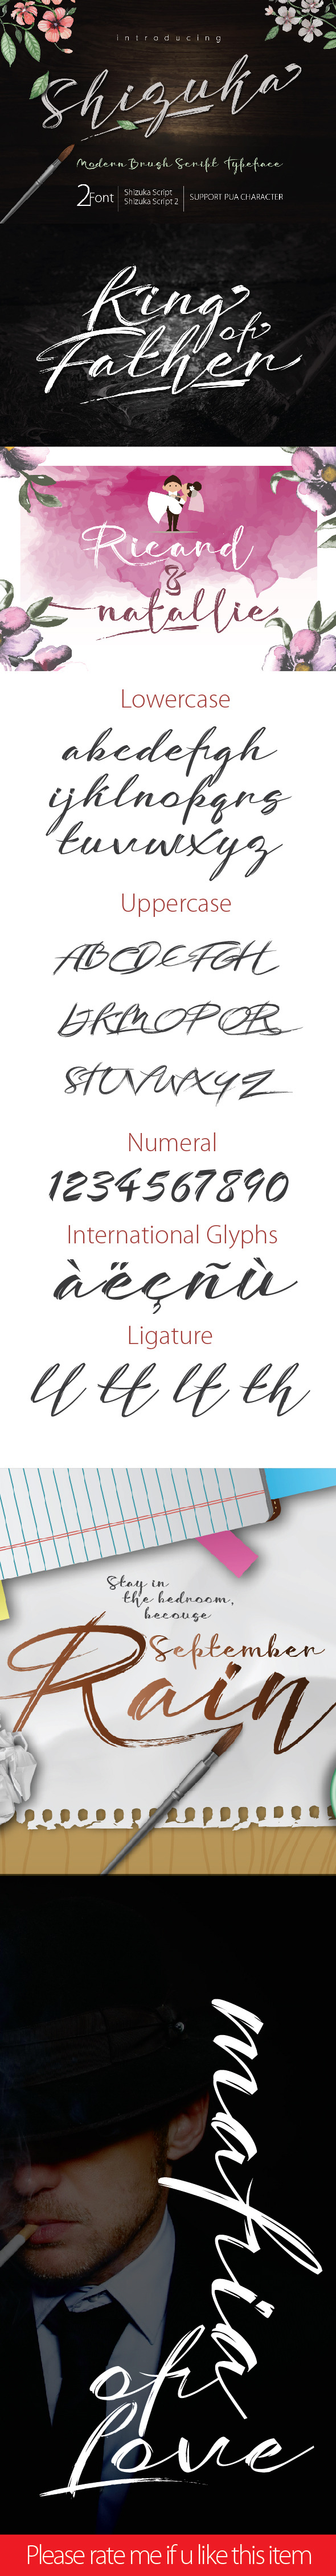 Shizuka script brush - Script Fonts